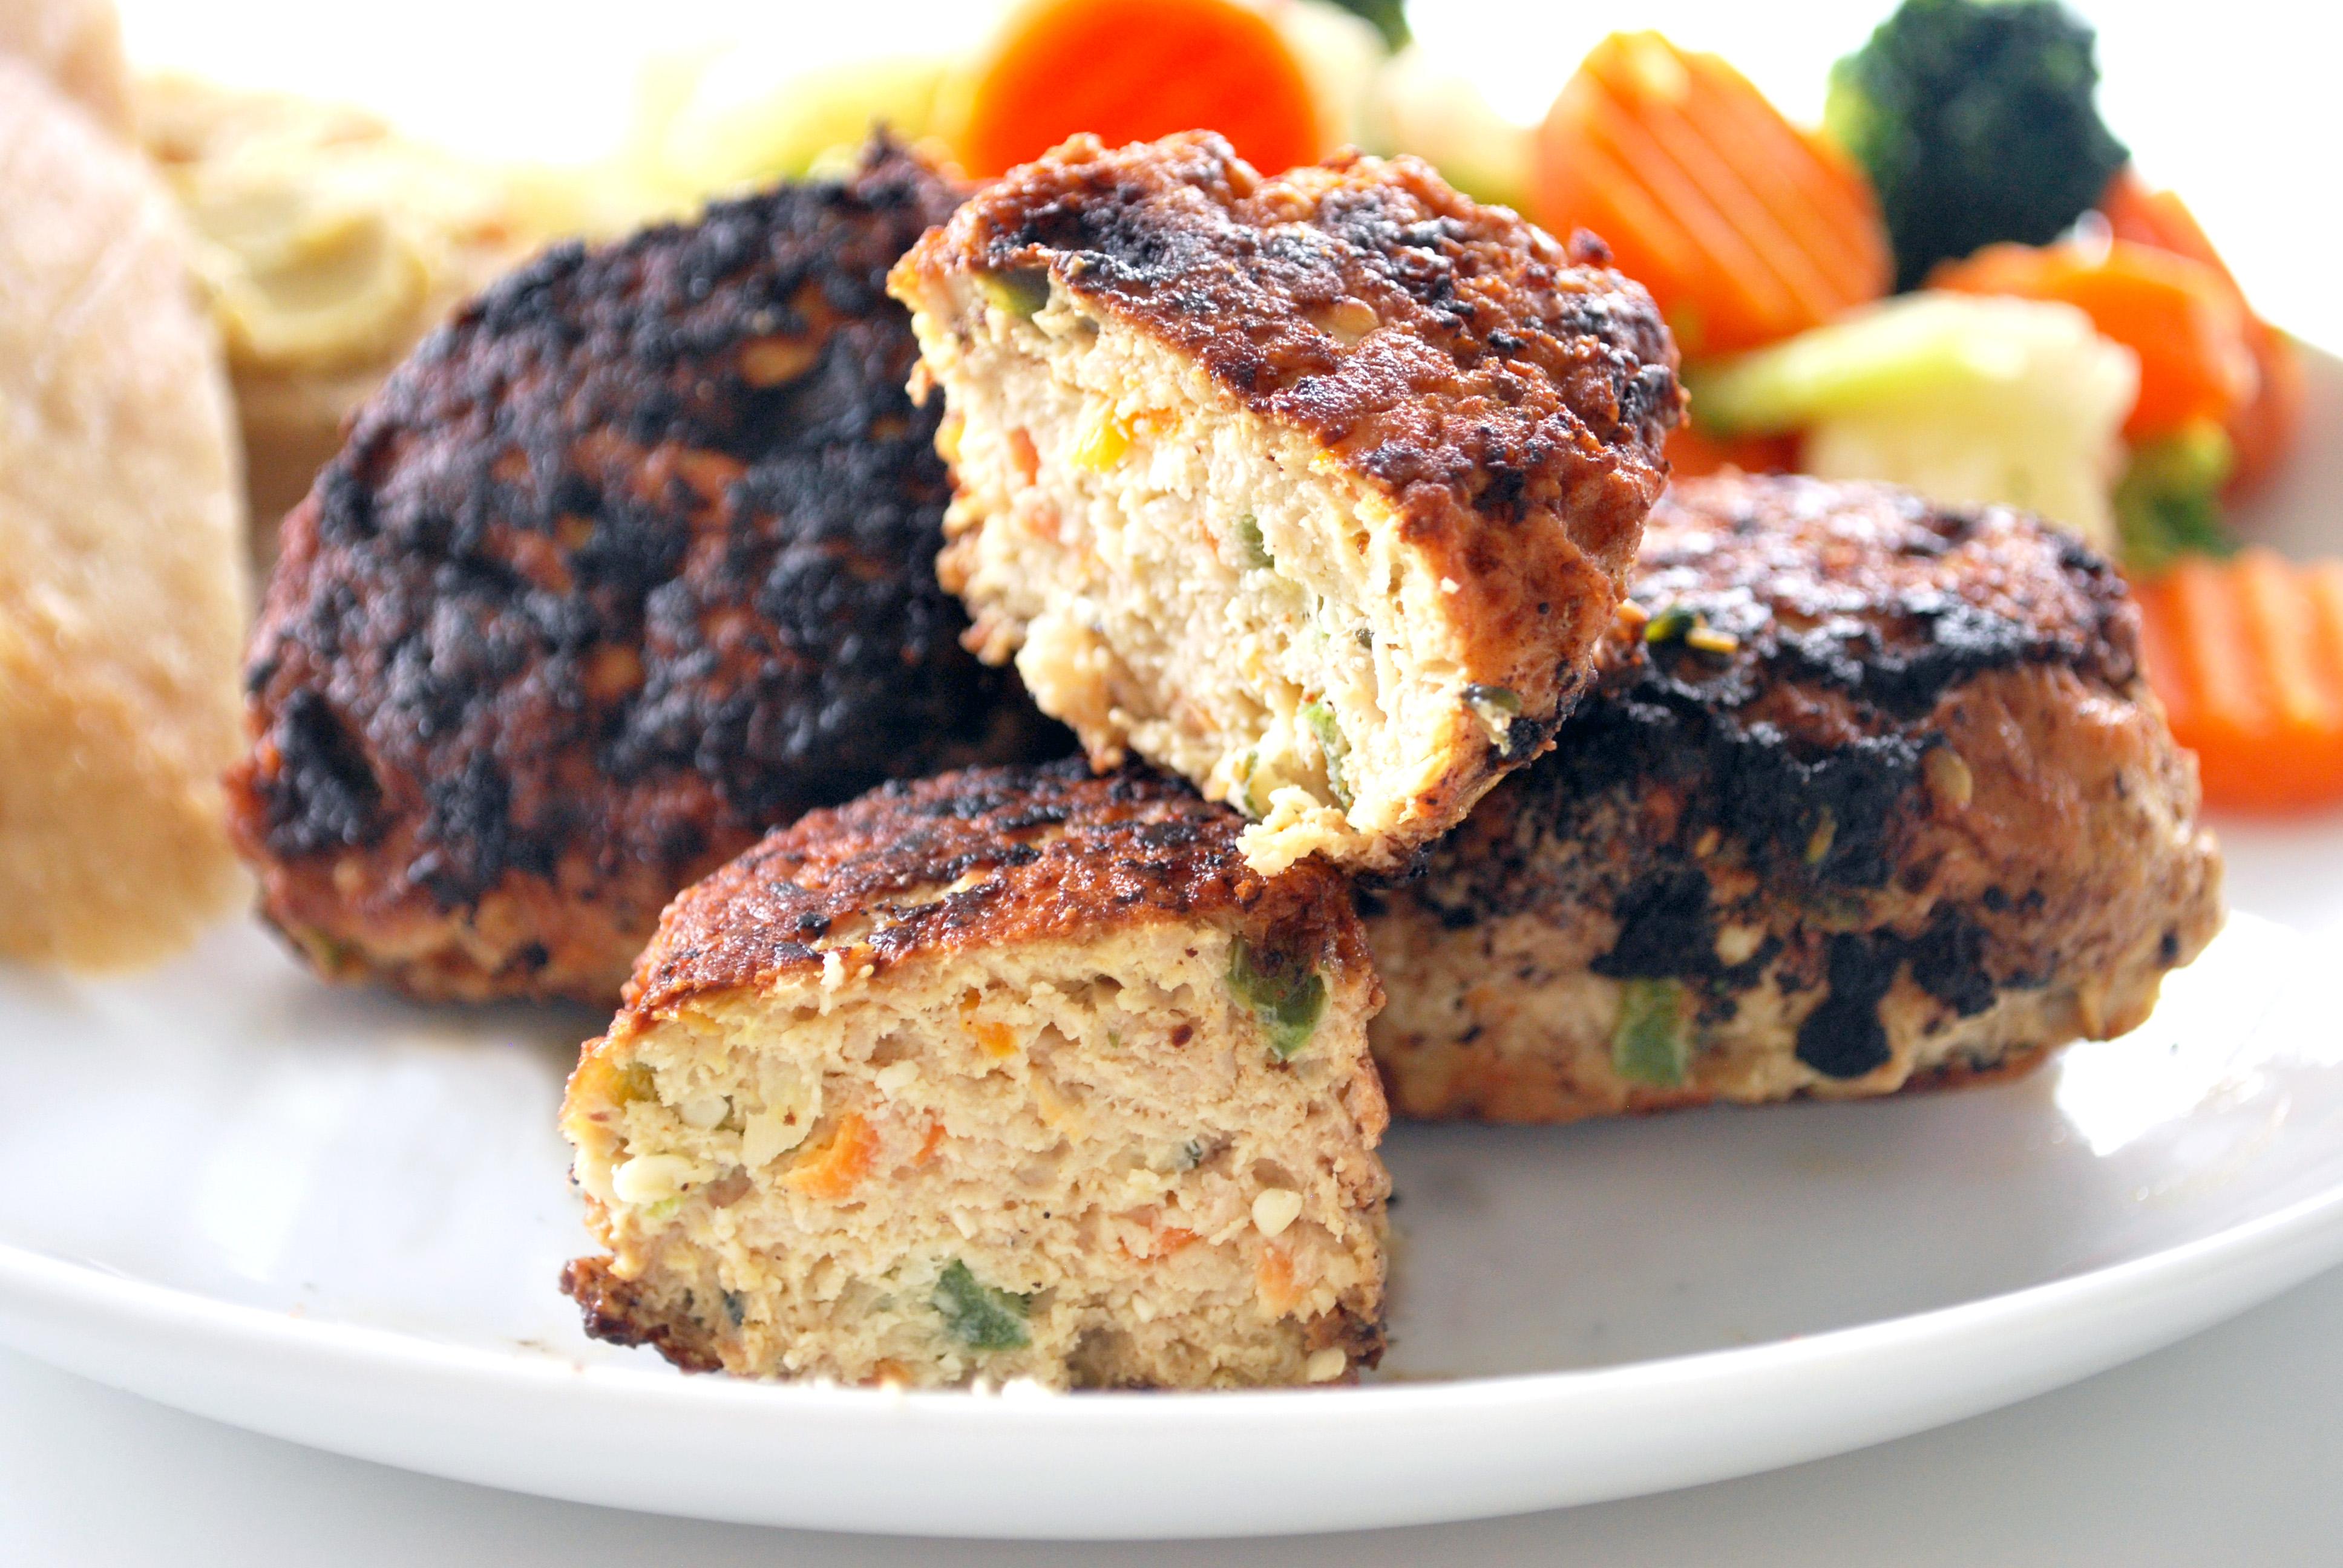 Kylling frikadeller med hampefrø og grøntsager